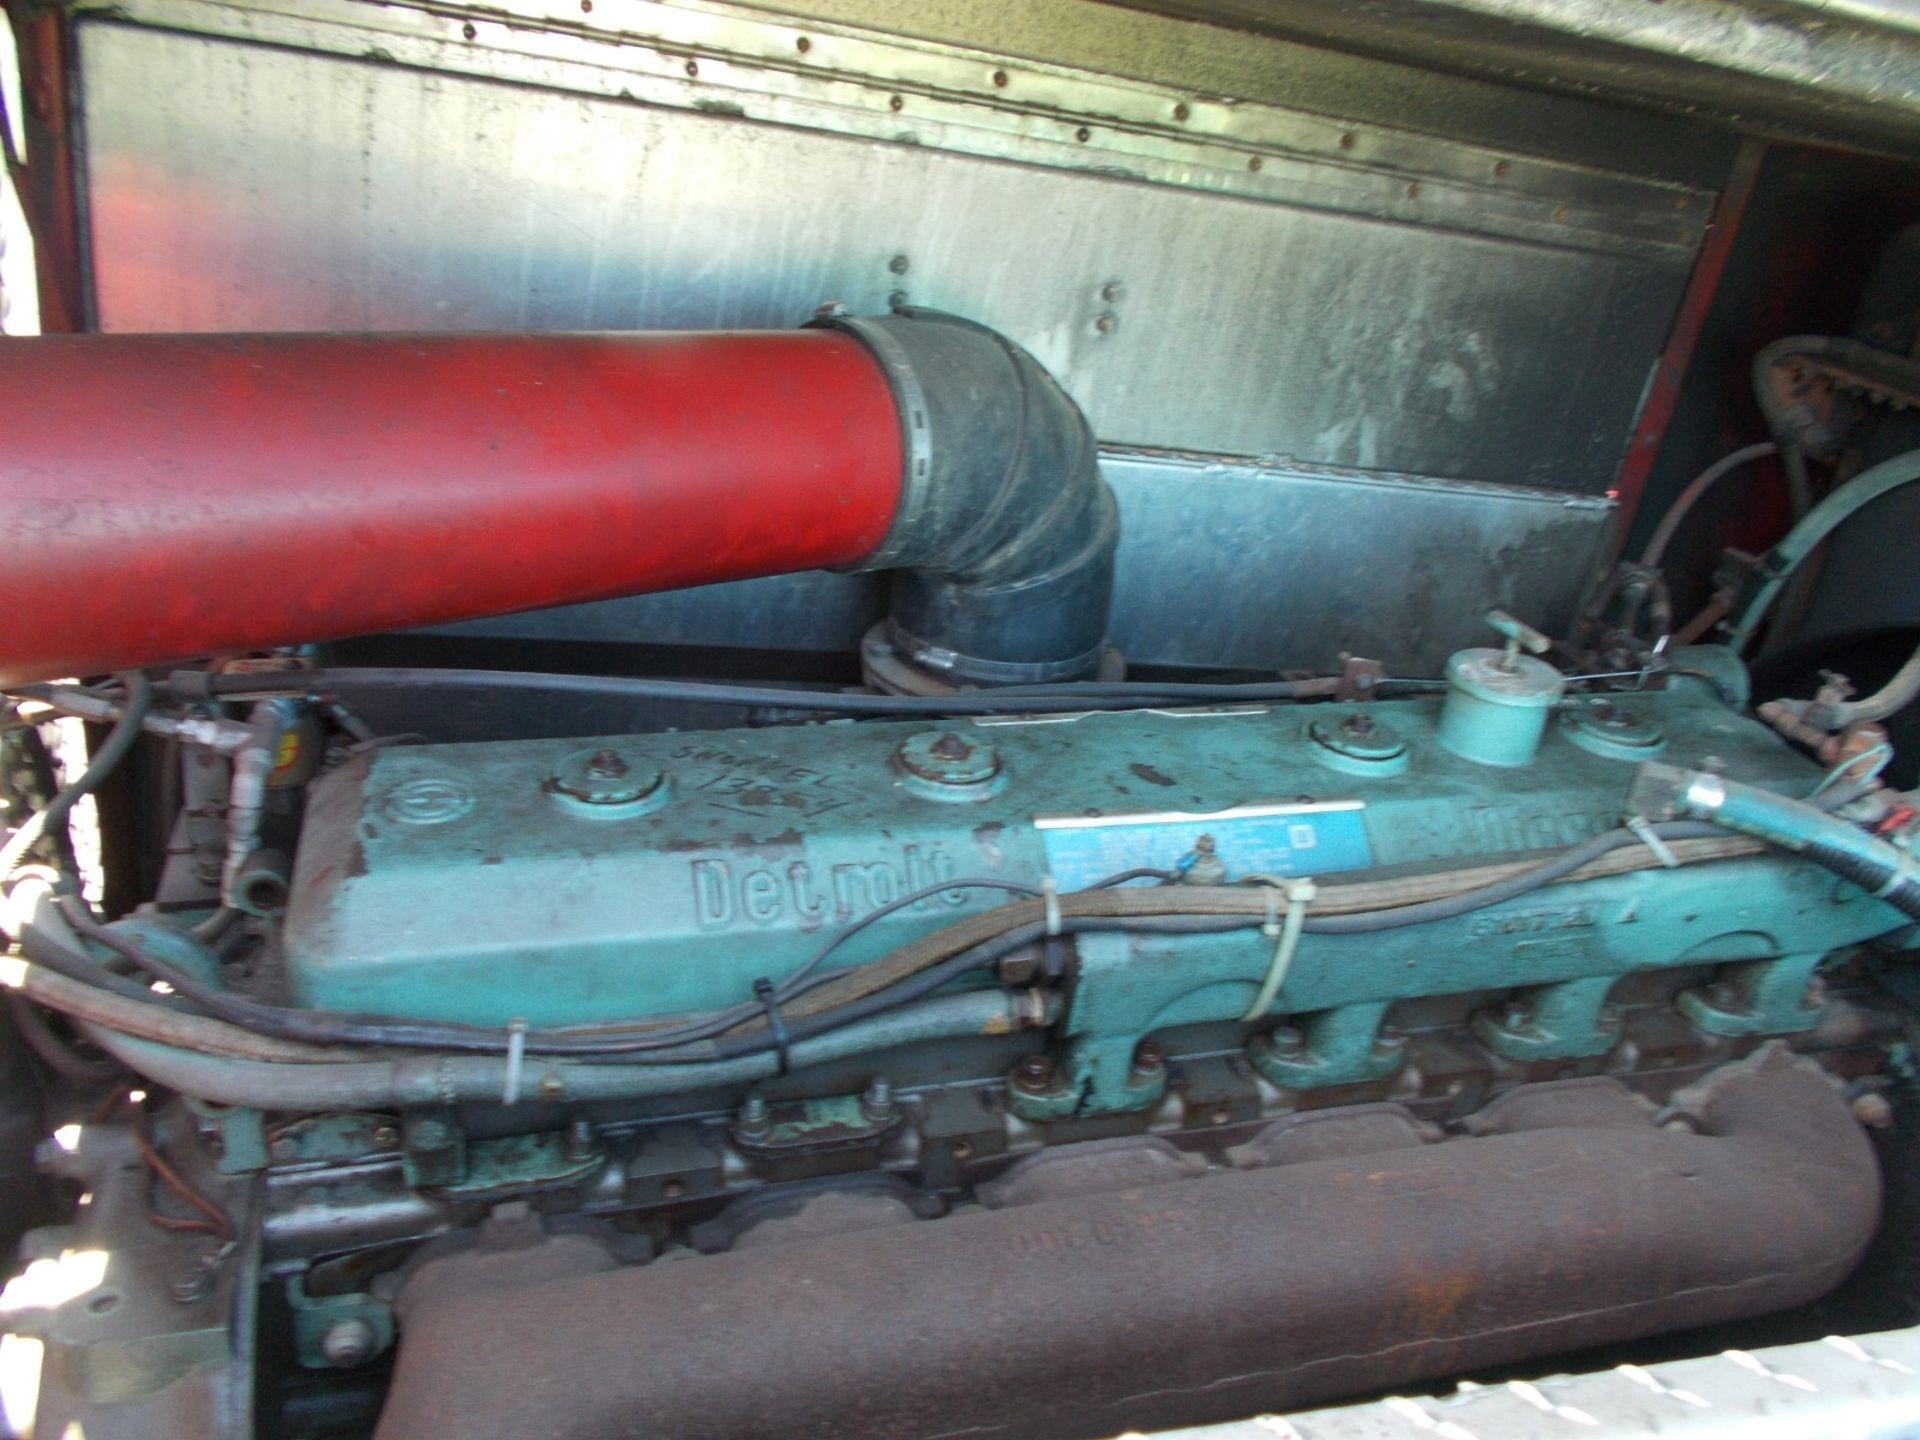 1978 HENDRICKSON 871-LPS SNORKEL FIRE TRUCK, U.S. IMPORT, 7.0 LITRE DETROIT DIESEL ENGINE *PLUS VAT* - Image 22 of 22